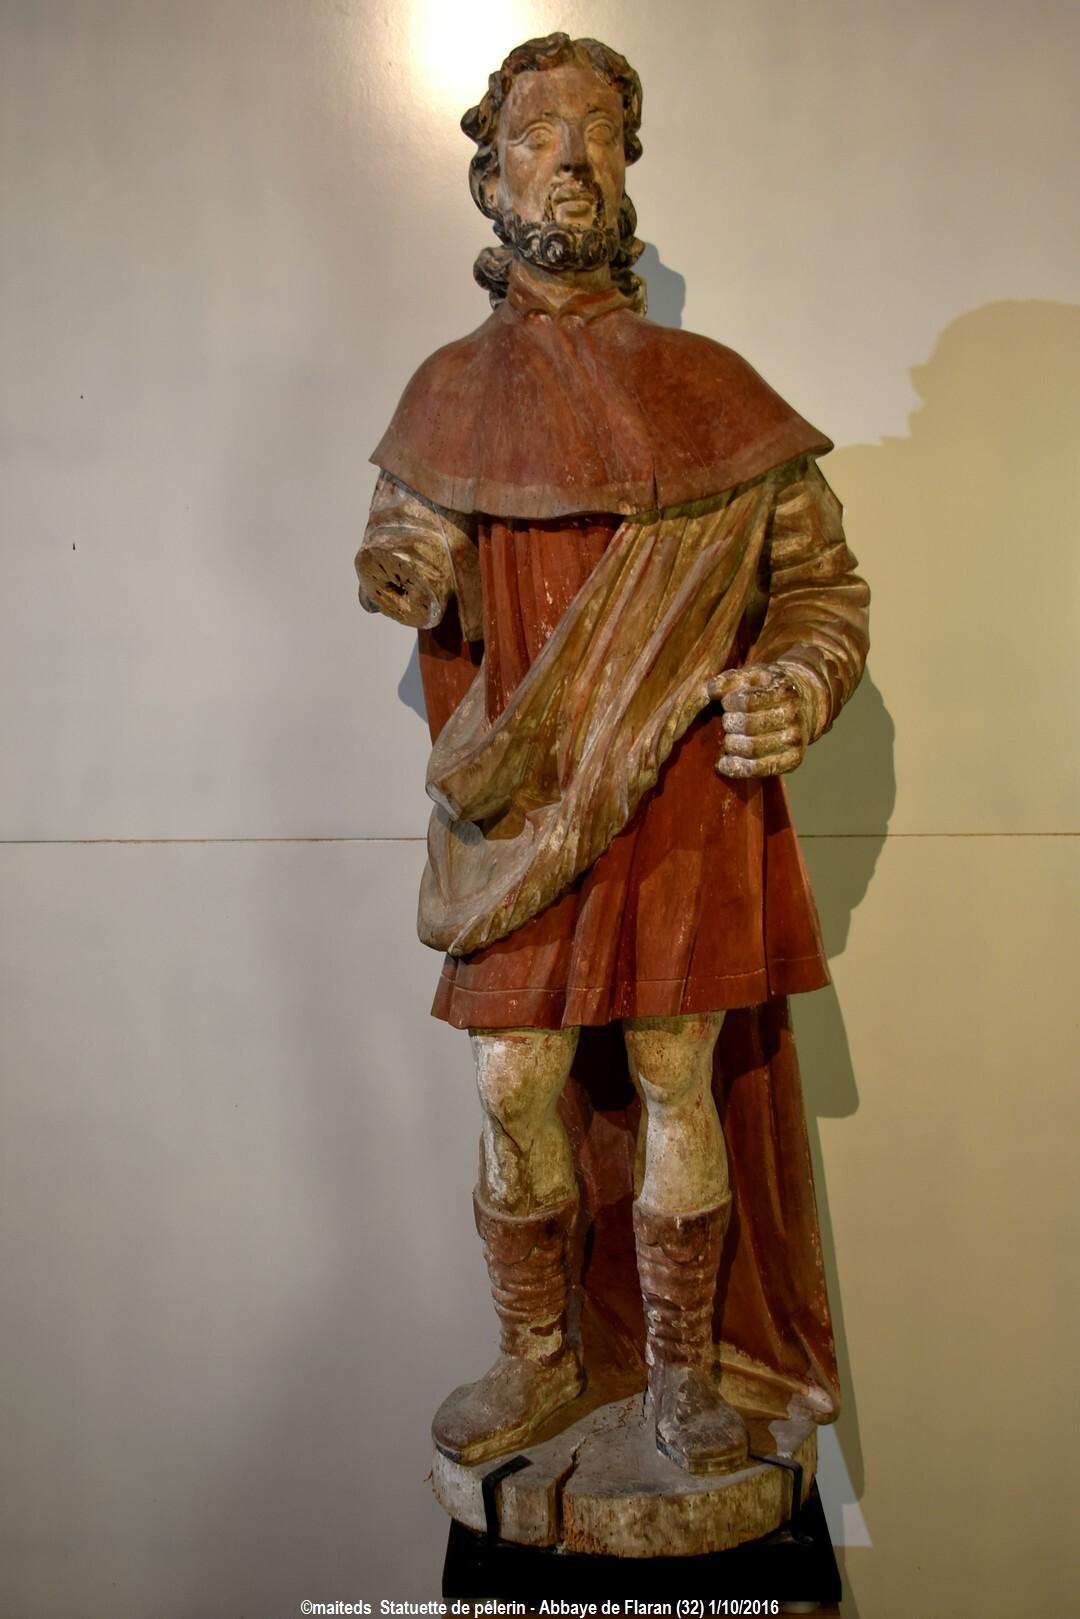 Statuette d'un pèlerin -  Abbaye de Flaran - Gers (4- suite et fin))